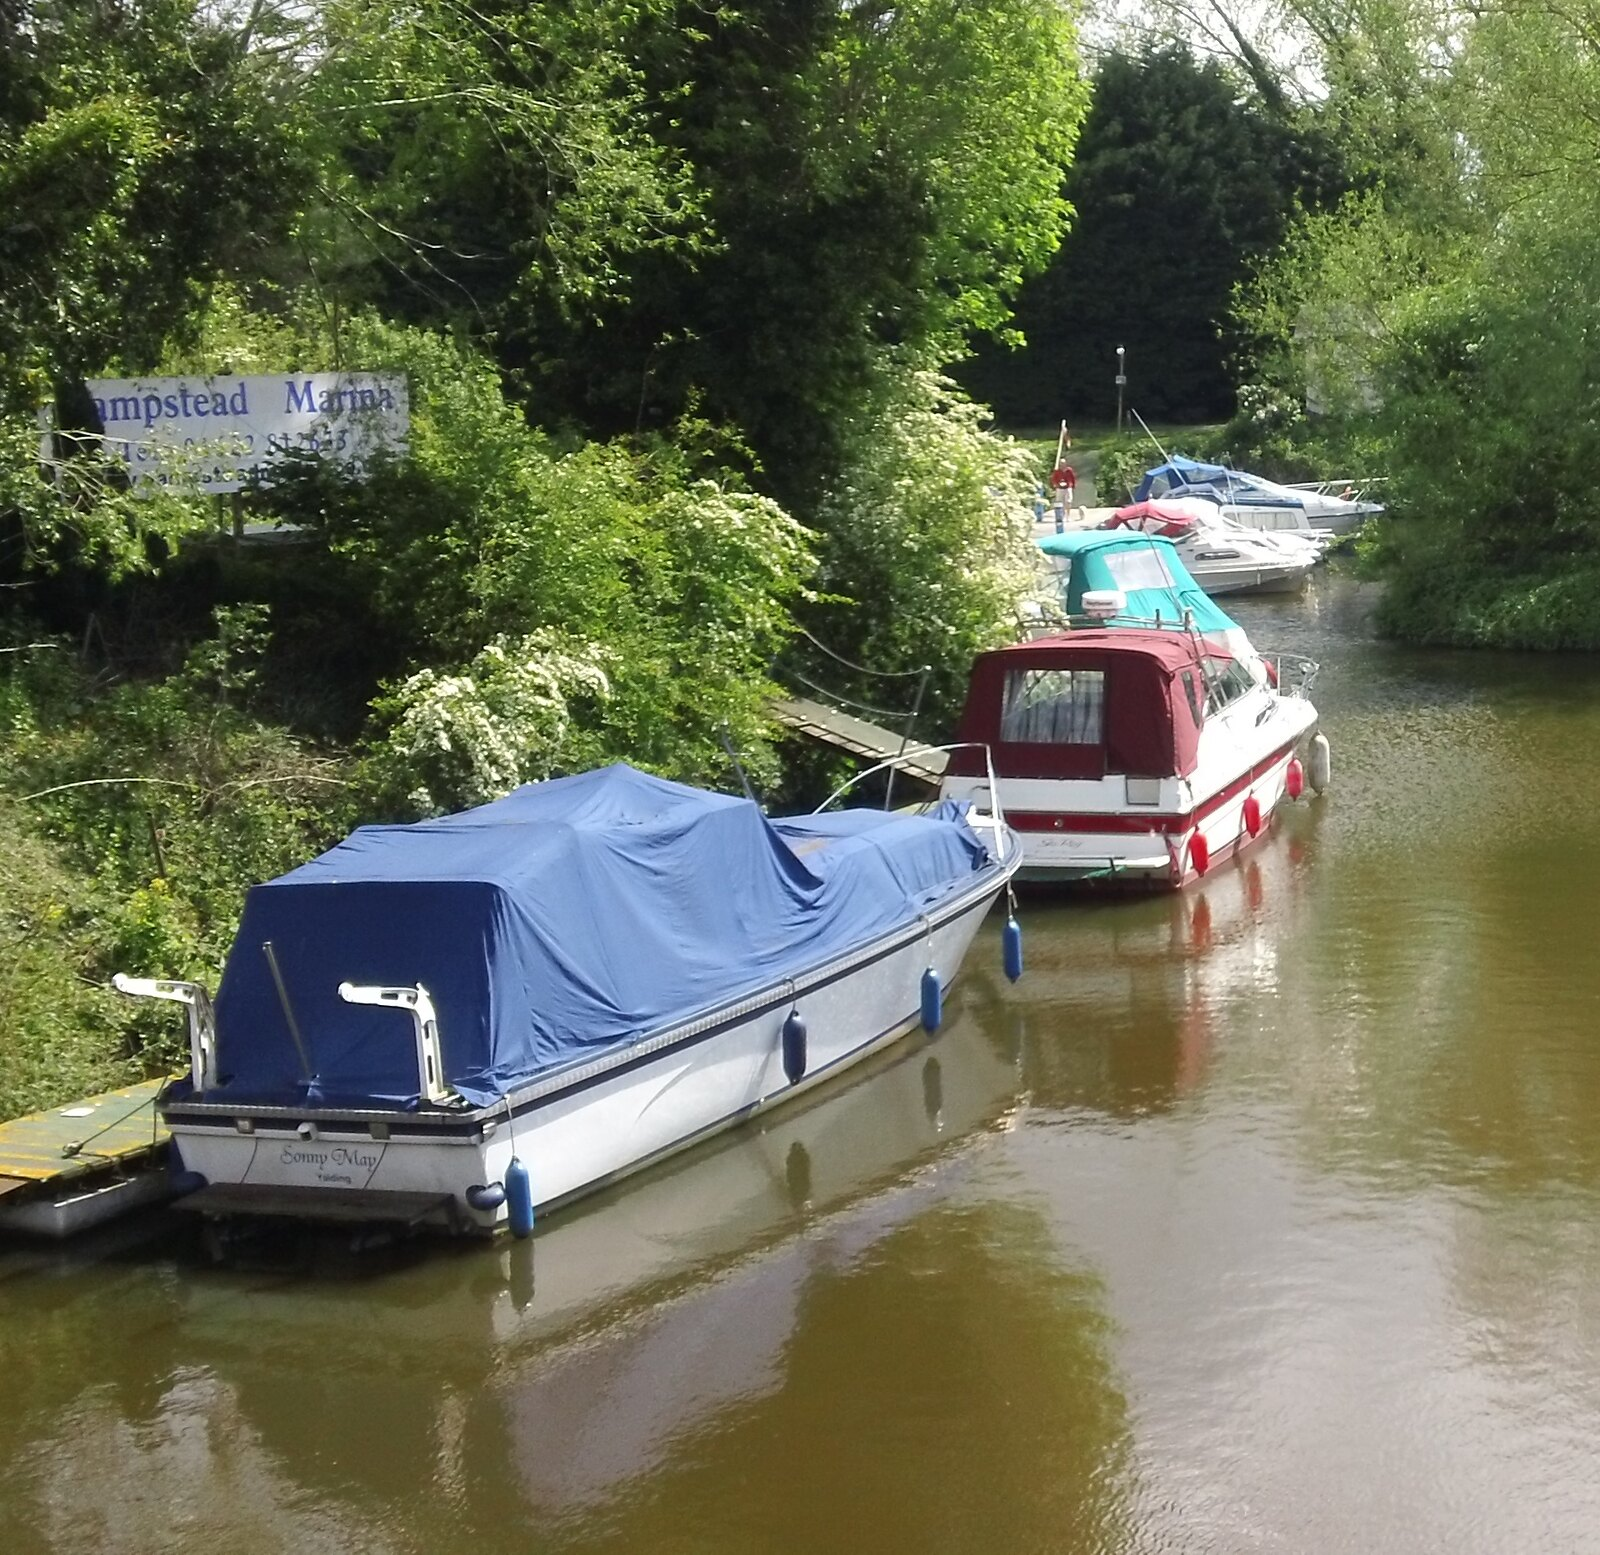 'ampstead Marina' Yalding, Kent